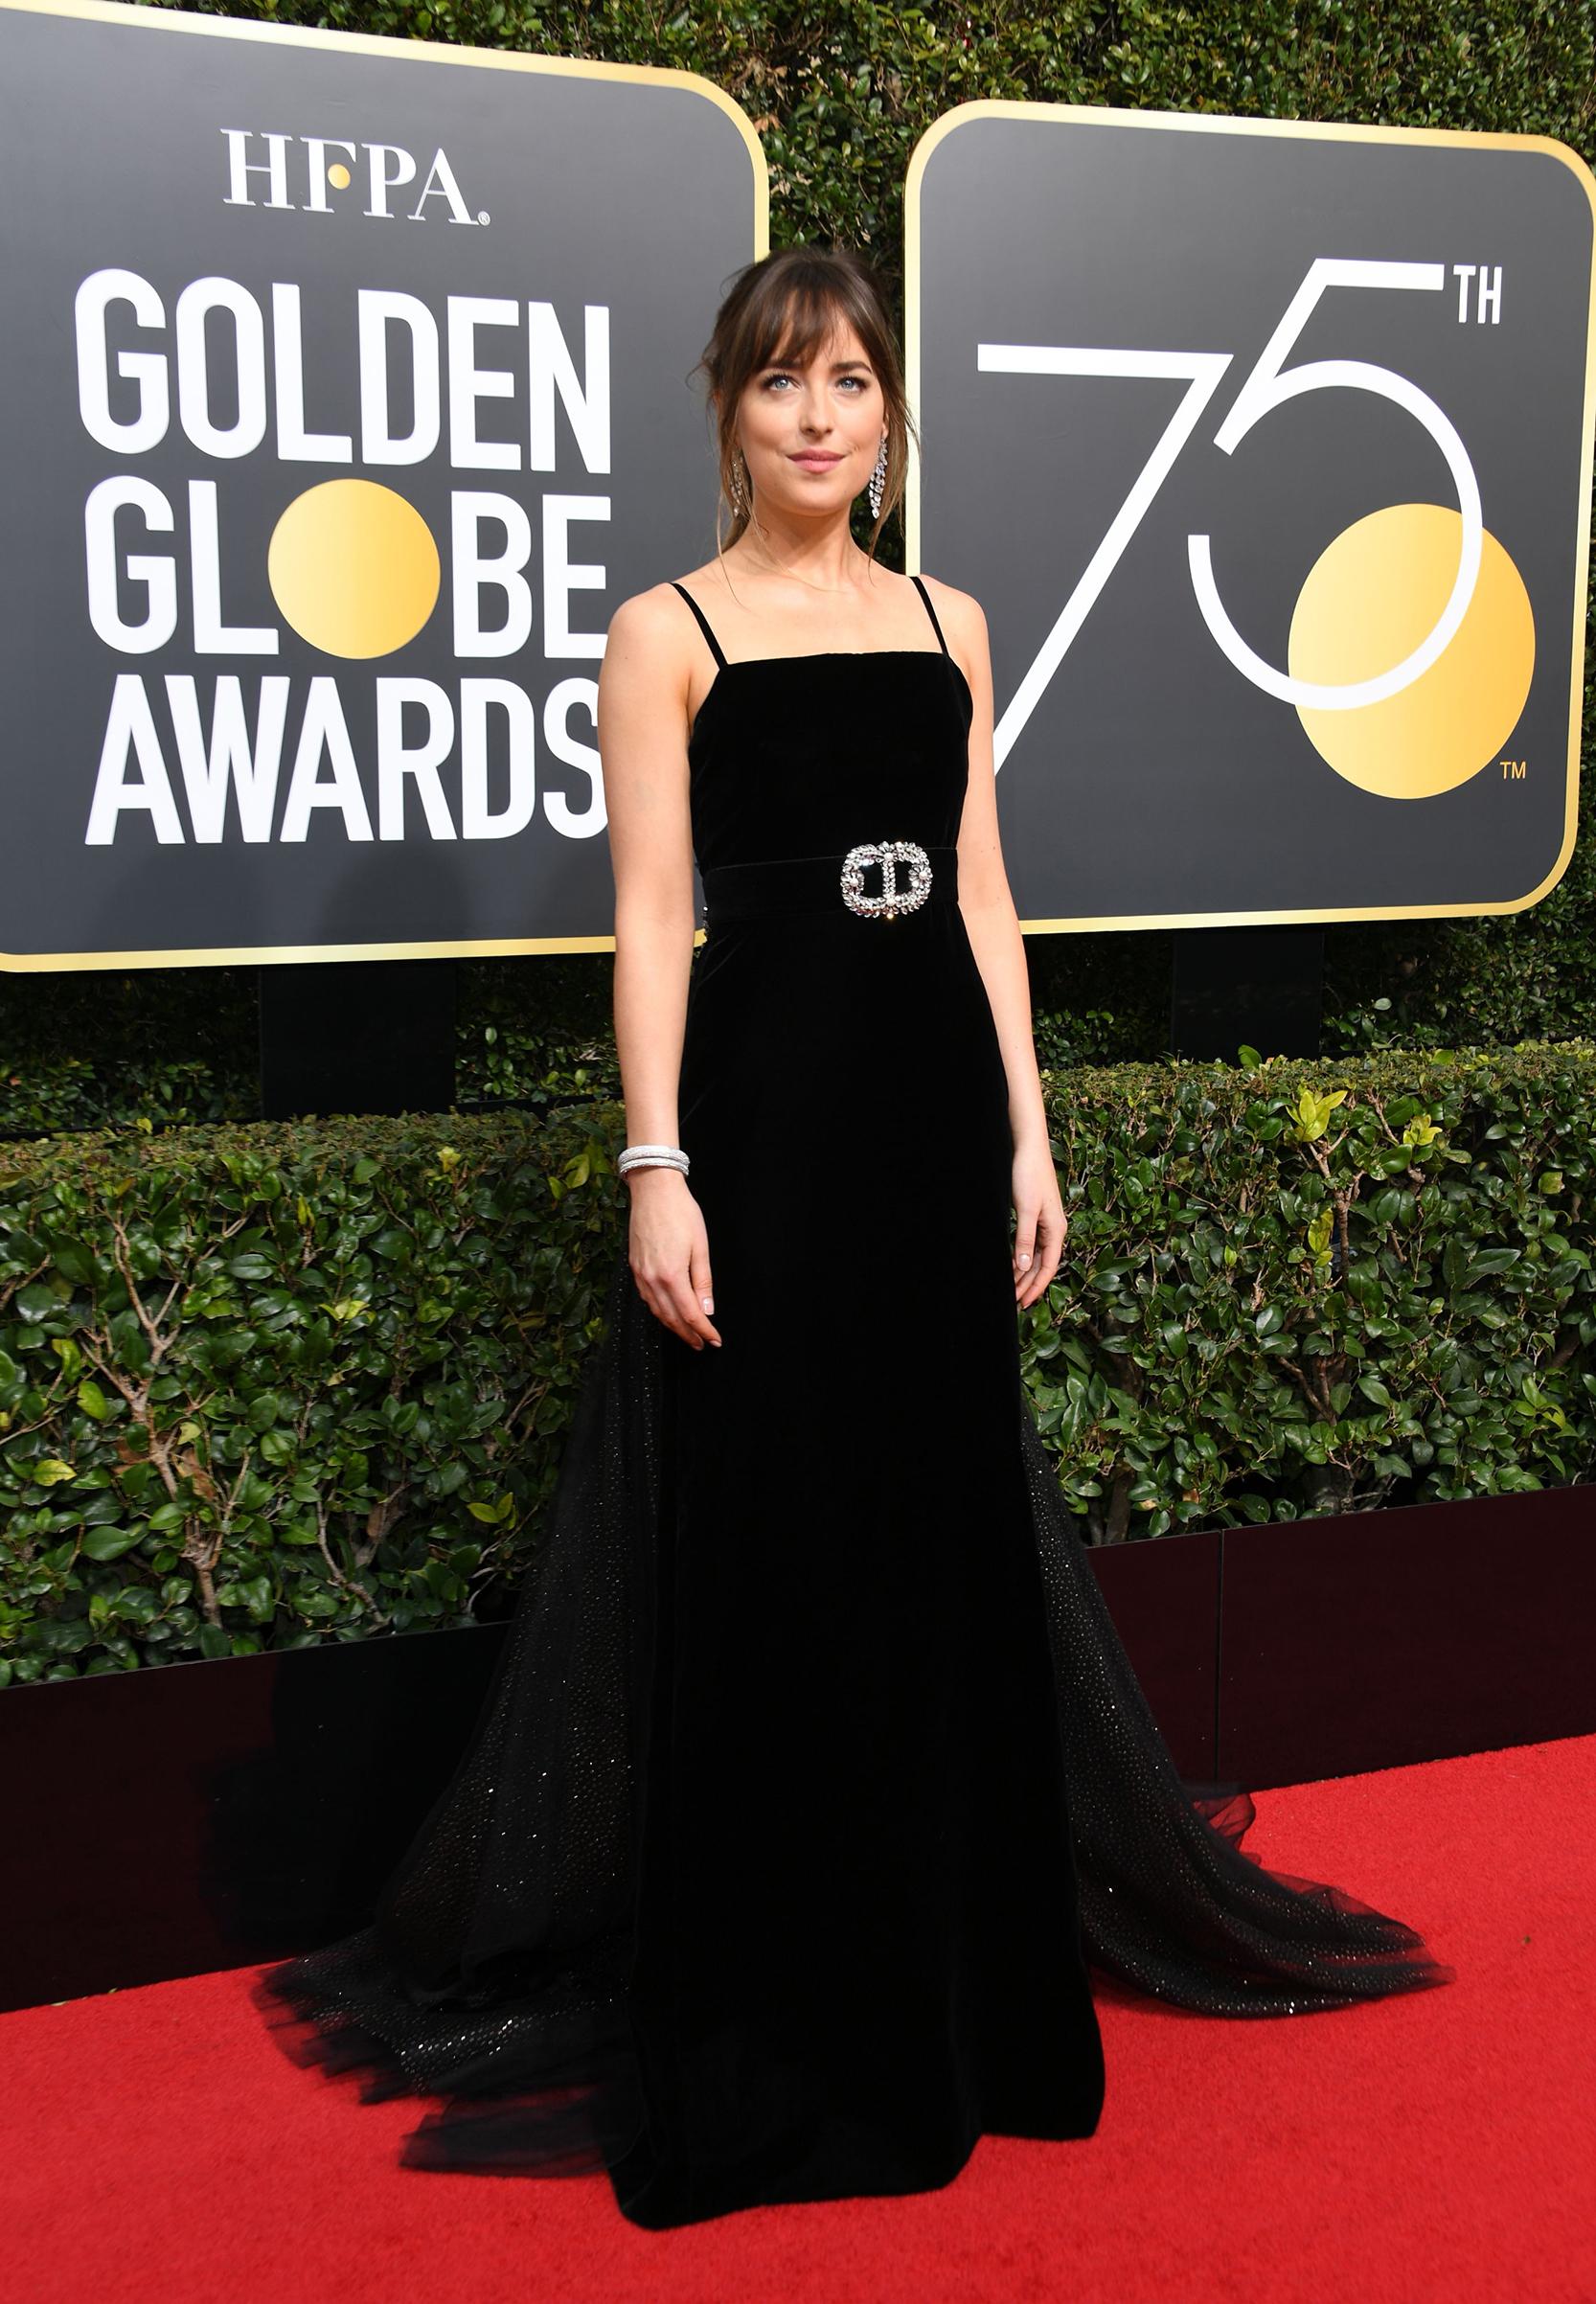 Actress Dakota Johnson arrives for the 75th Golden Globe Awards on January 7, 2018, in Beverly Hills, California.